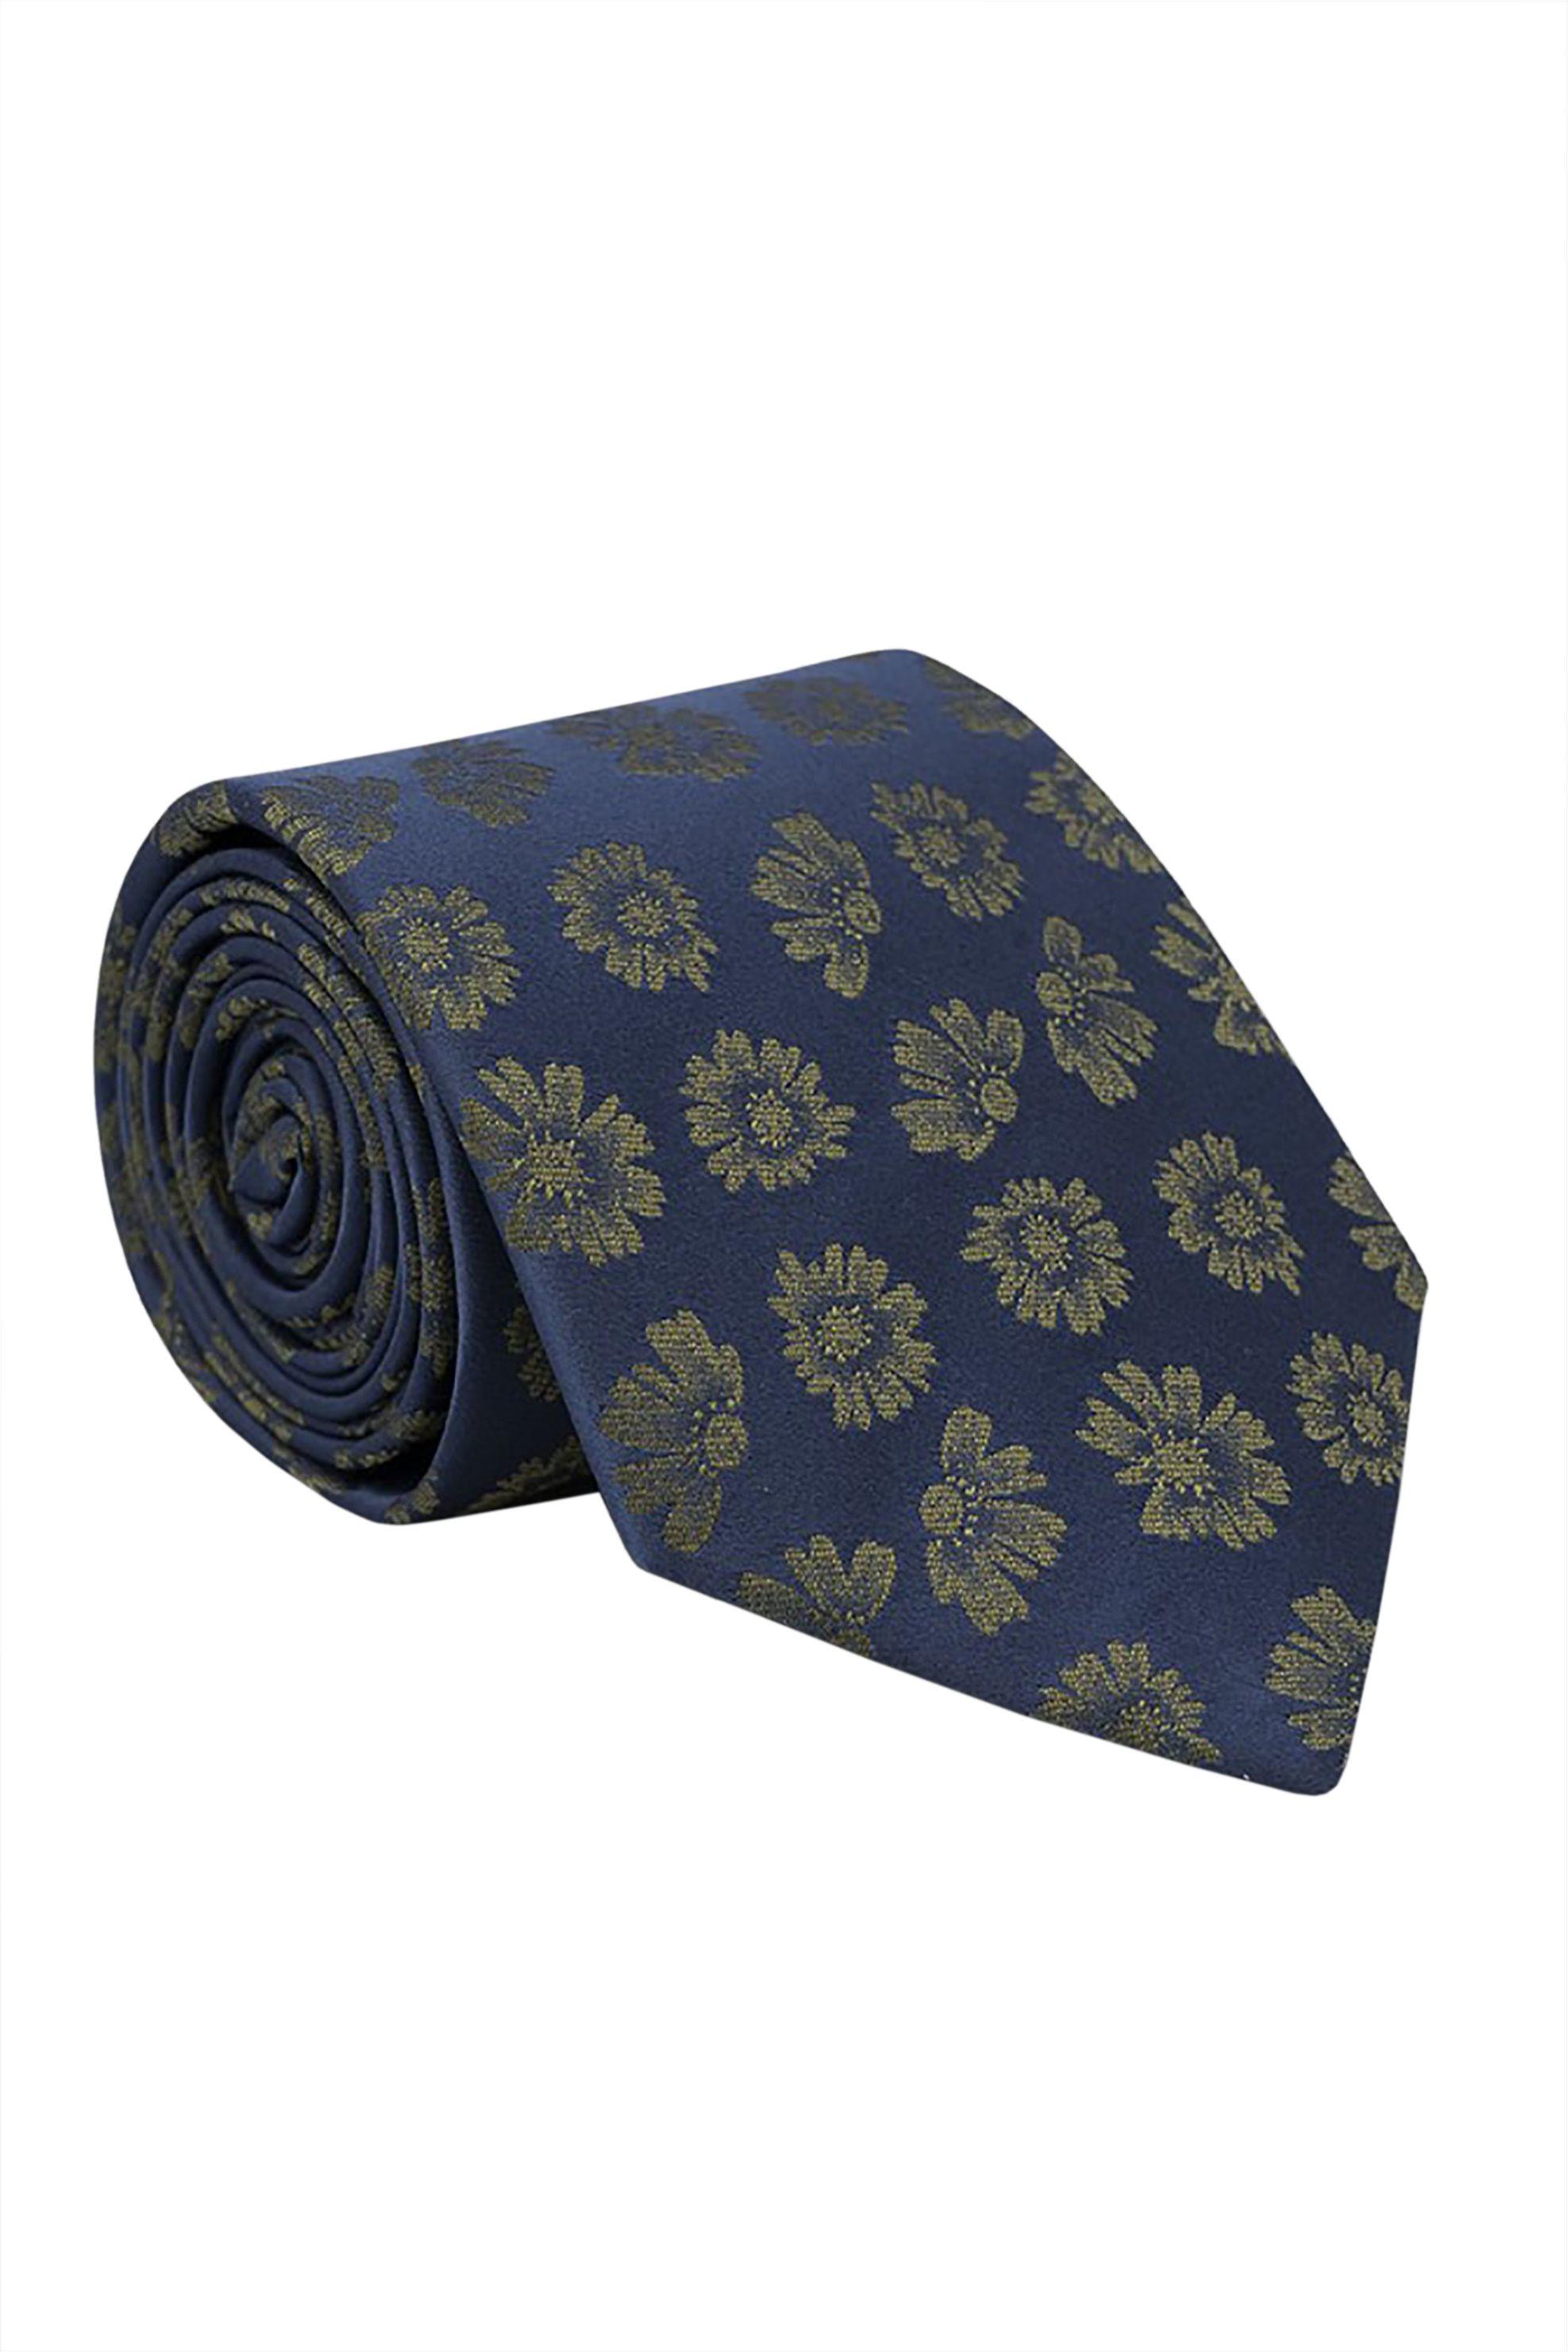 Oxford Company ανδρική μεταξωτή γραβάτα με floral print - TIE51-413.04 - Μπλε Σκούρο